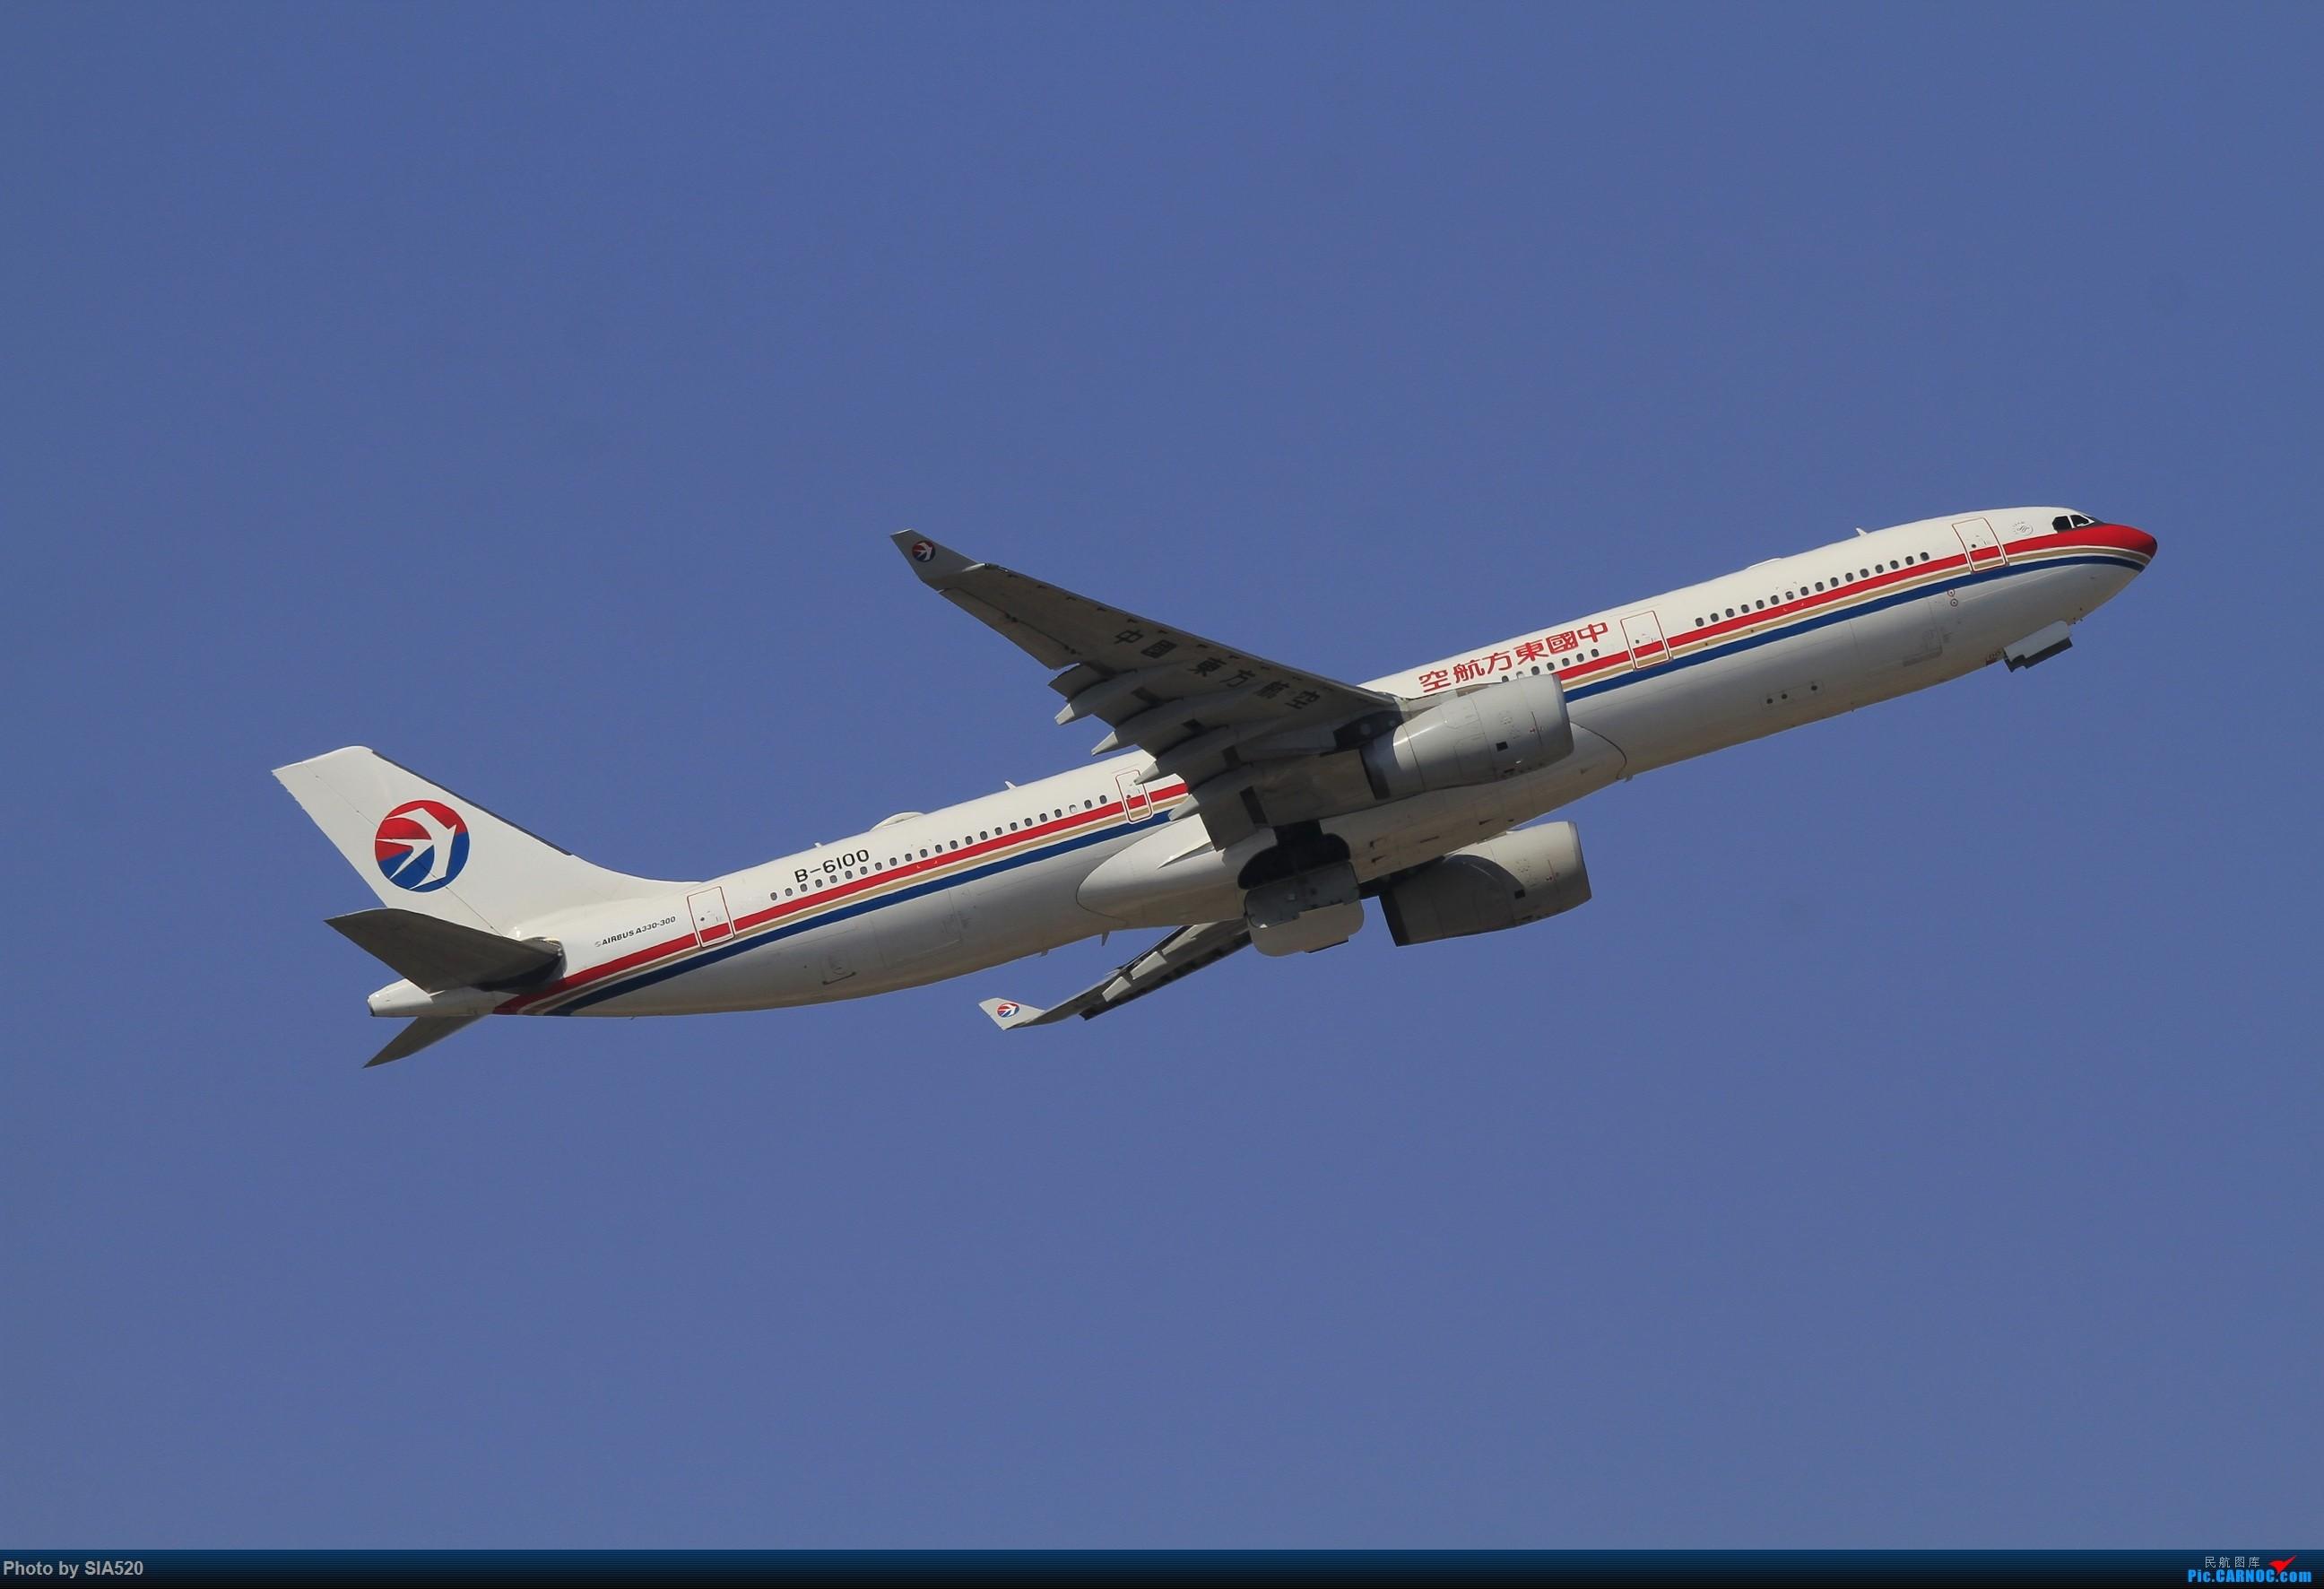 Re:[原创]北京人儿在三亚—600mm解锁凤凰 AIRBUS A330-300 B-6100 中国三亚凤凰国际机场